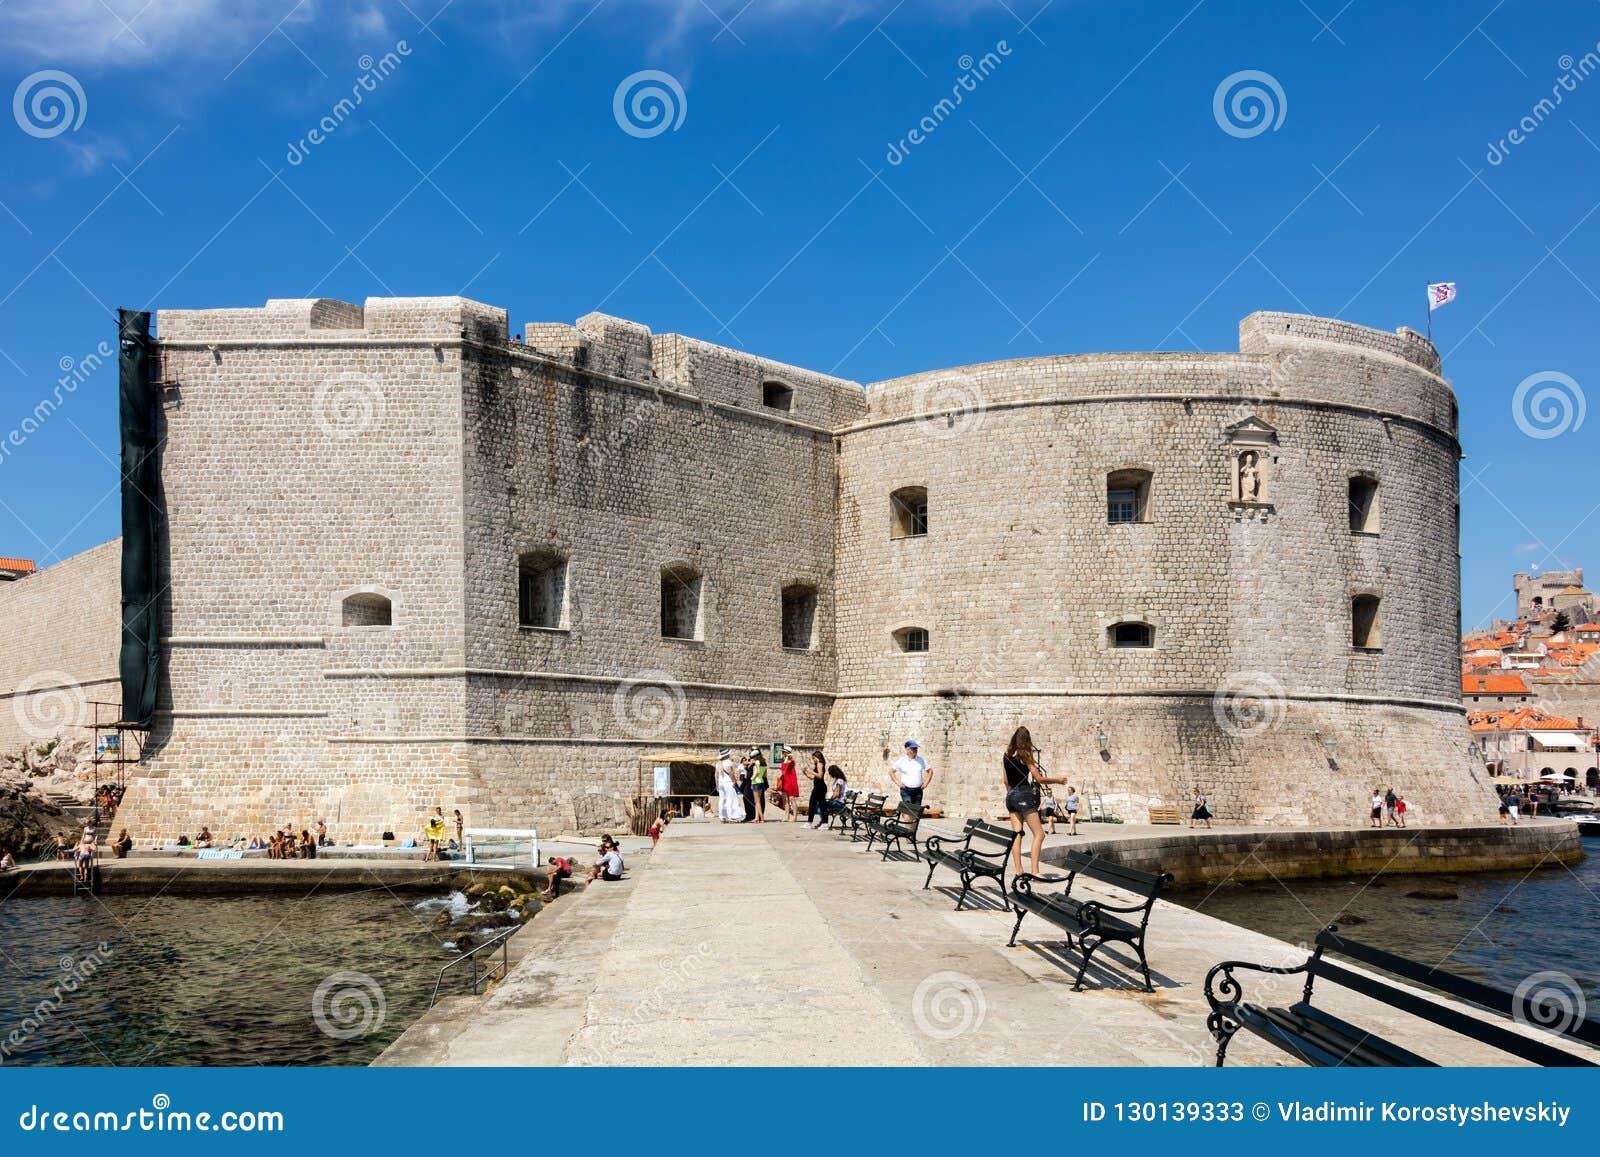 Fort St John w Dubrovnik, Chorwacja,